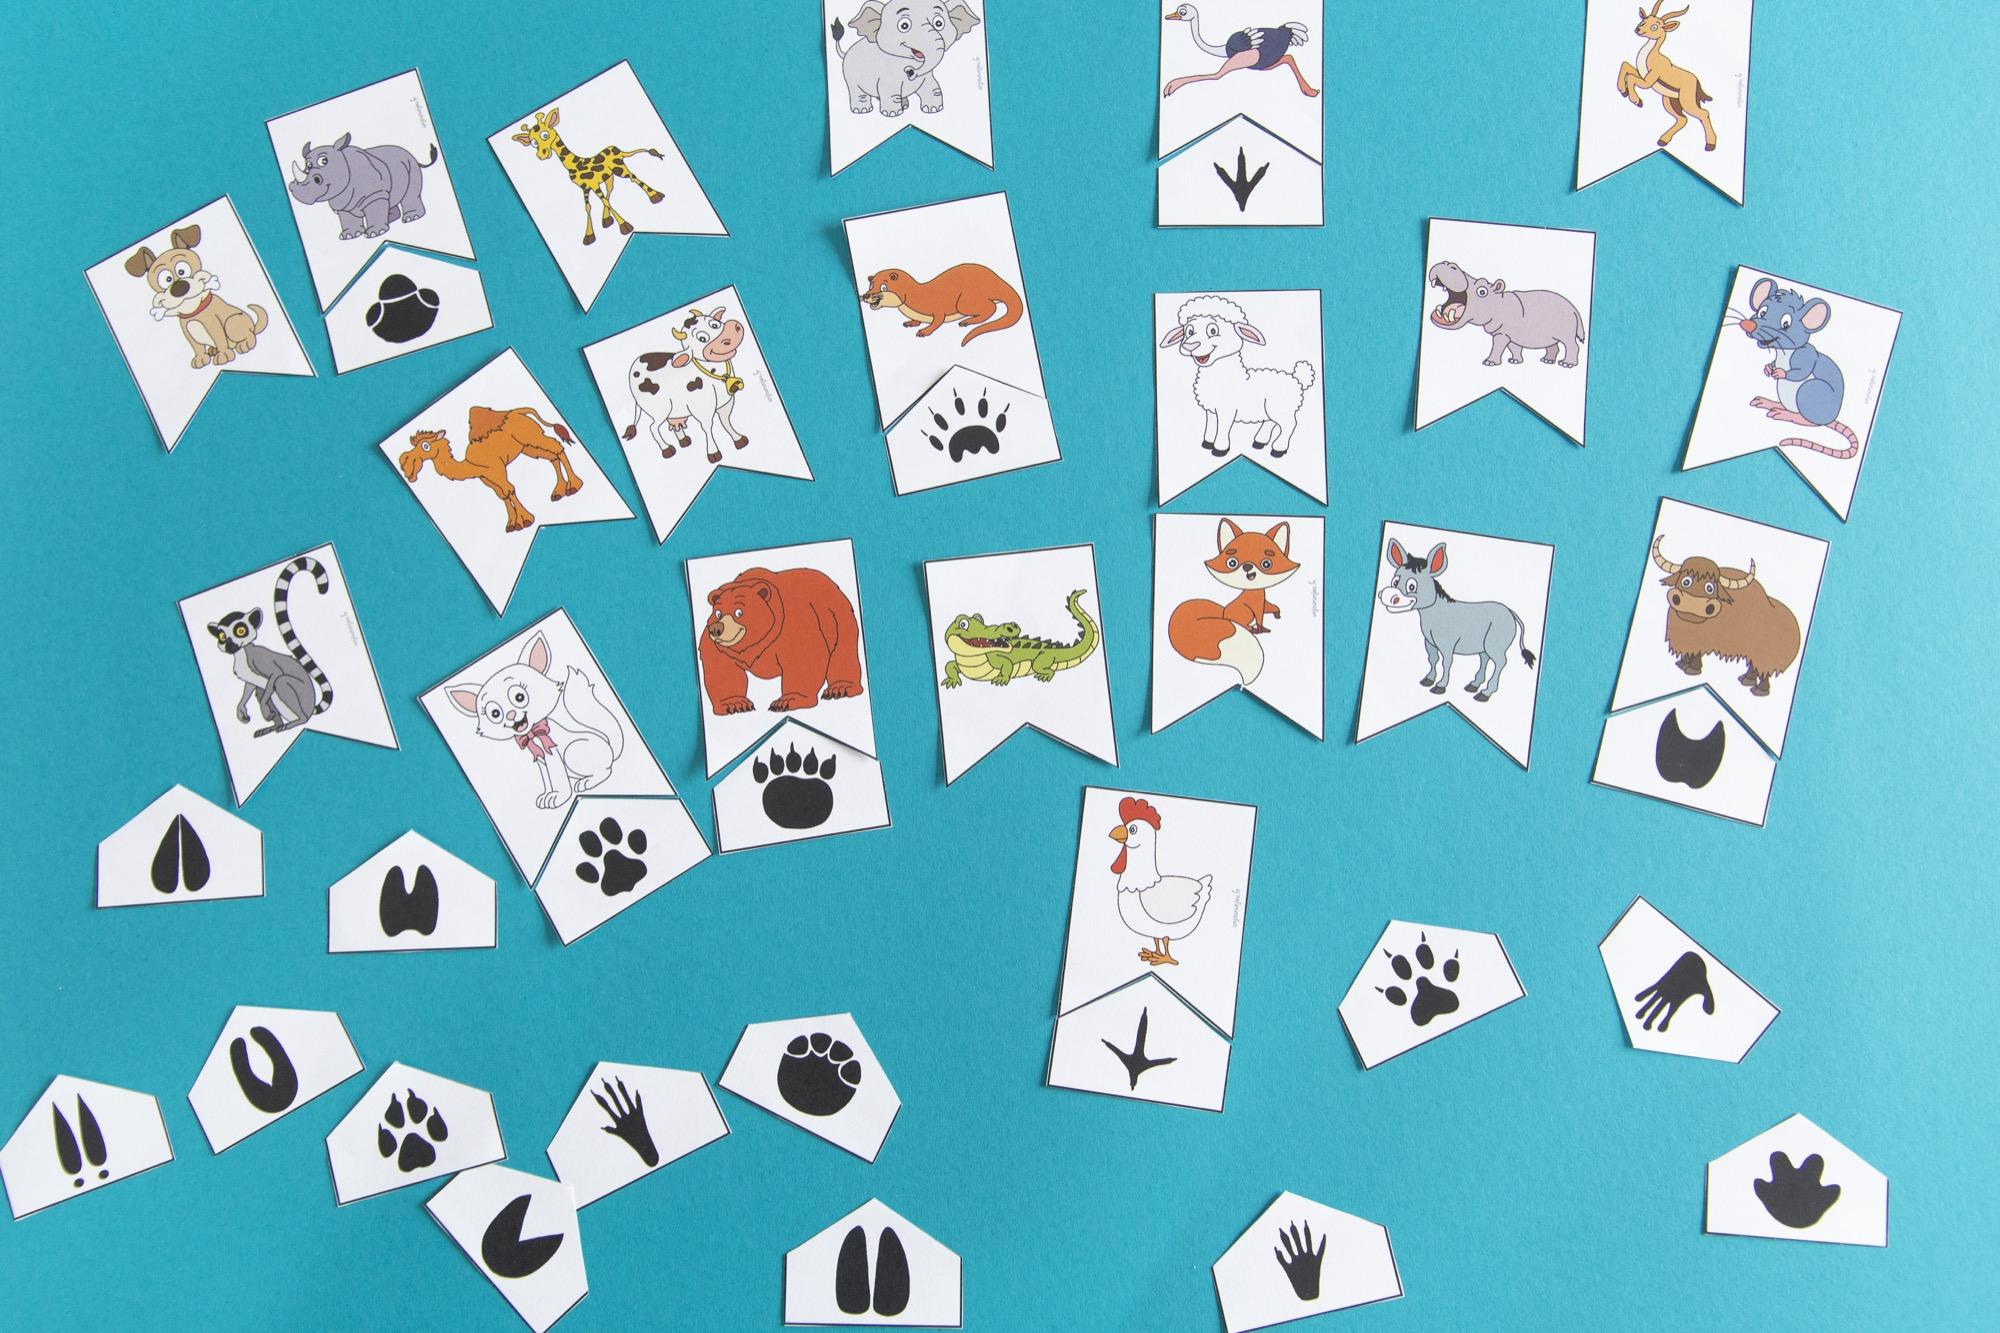 Empreintes animaux : étape 5